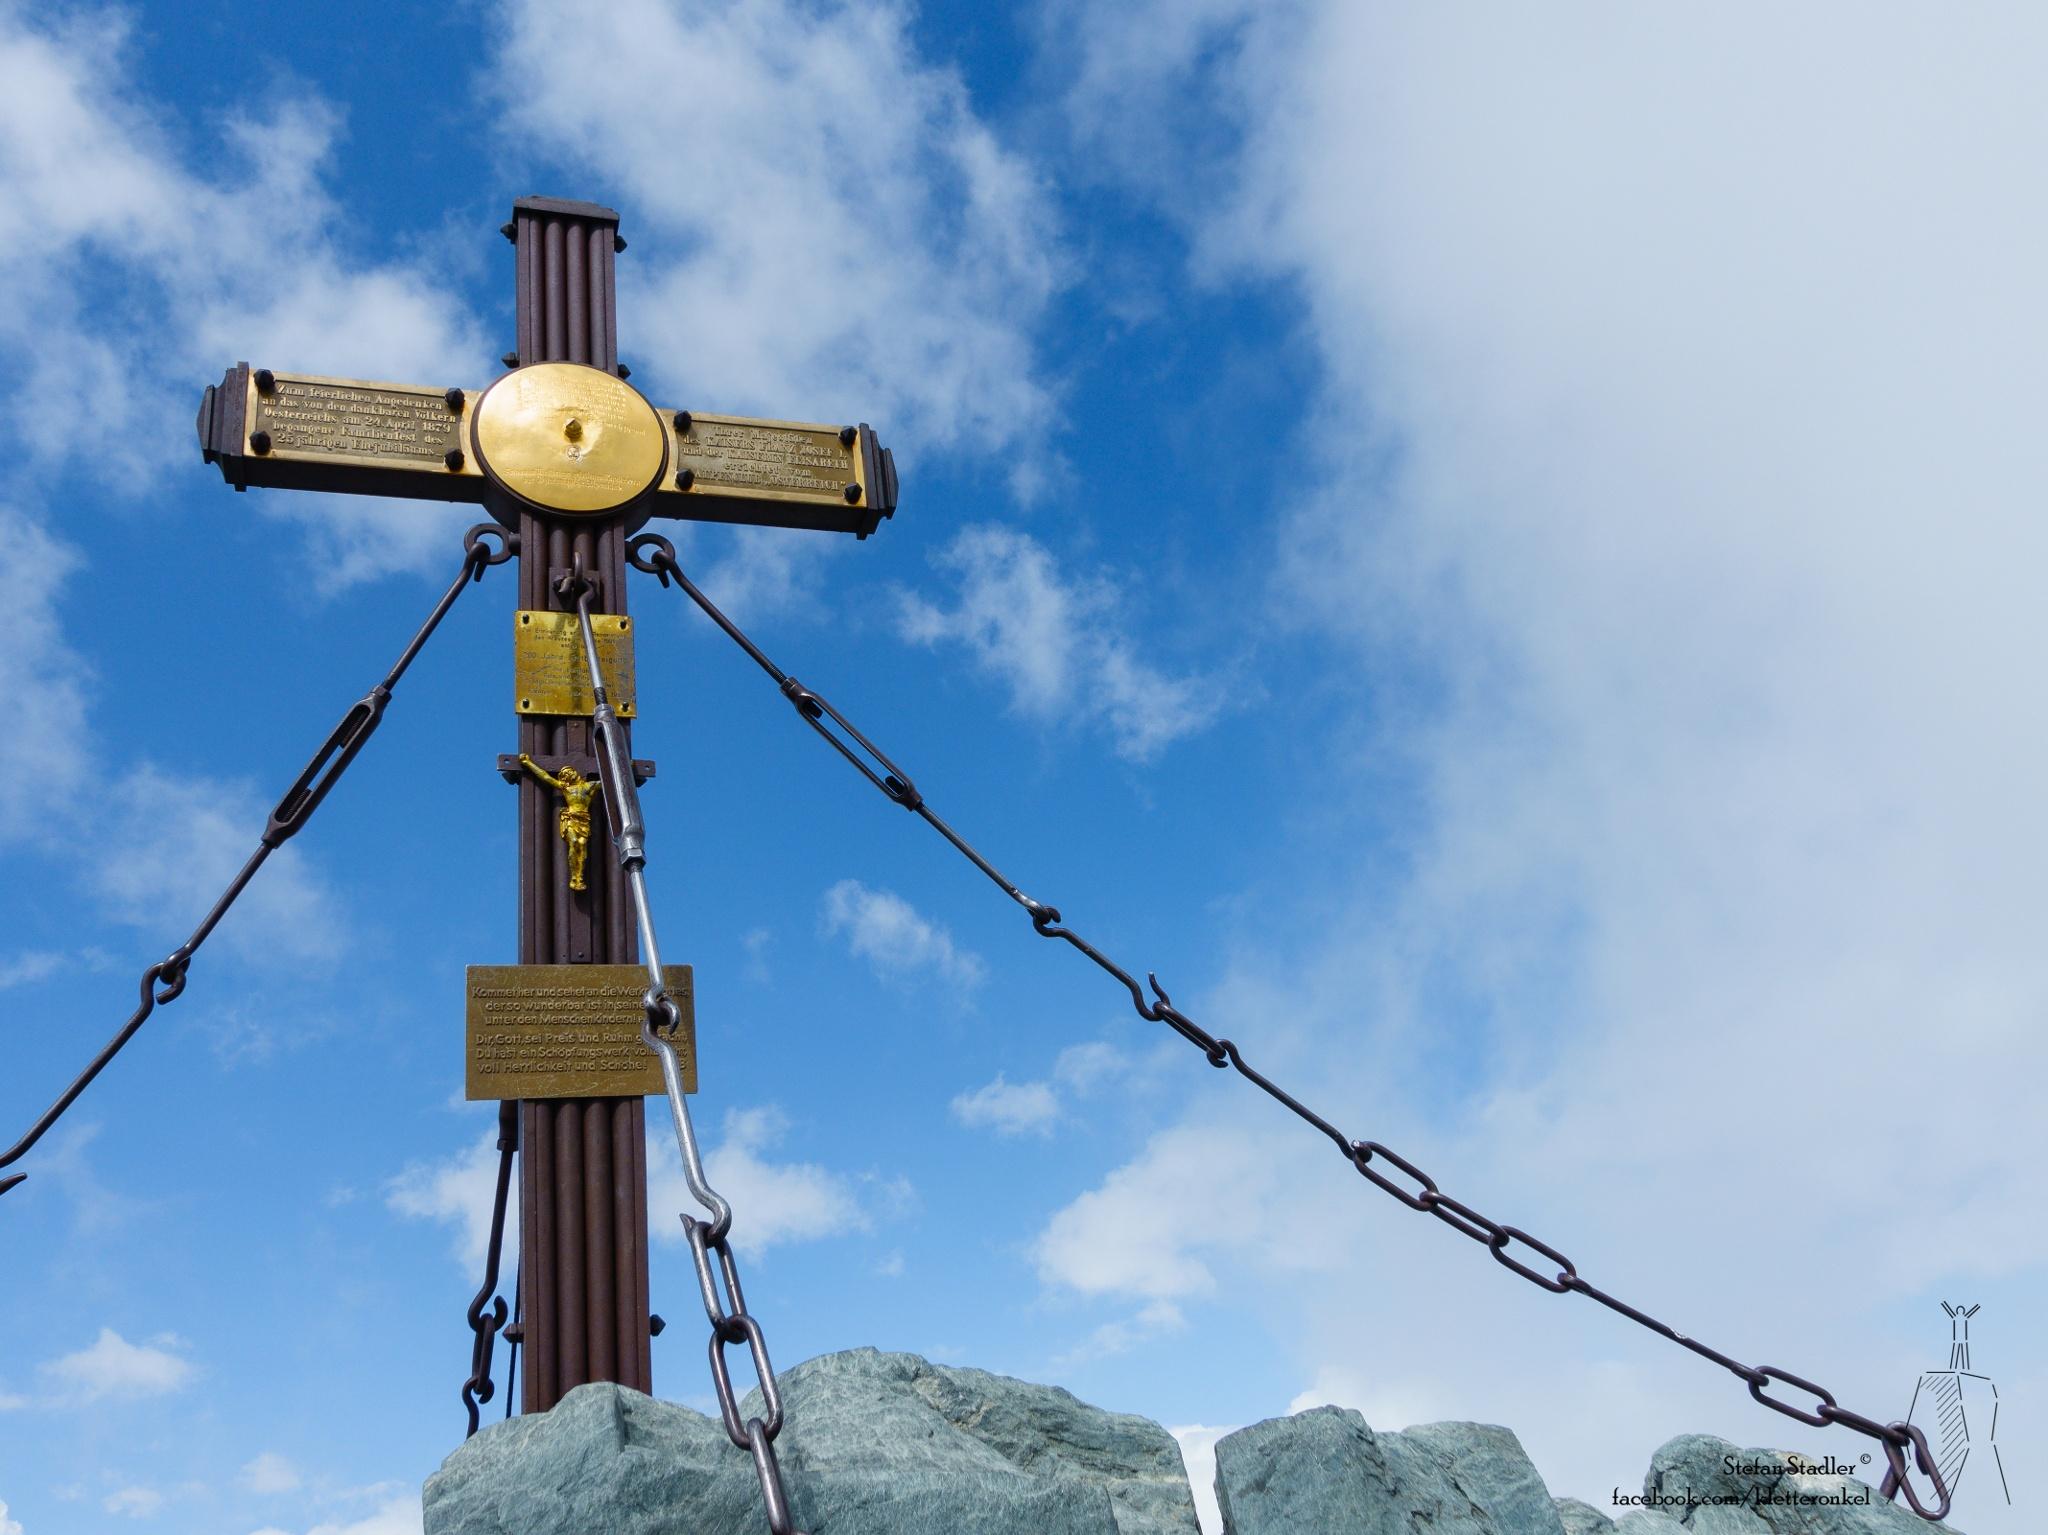 Gipfelkreuz Großglockner